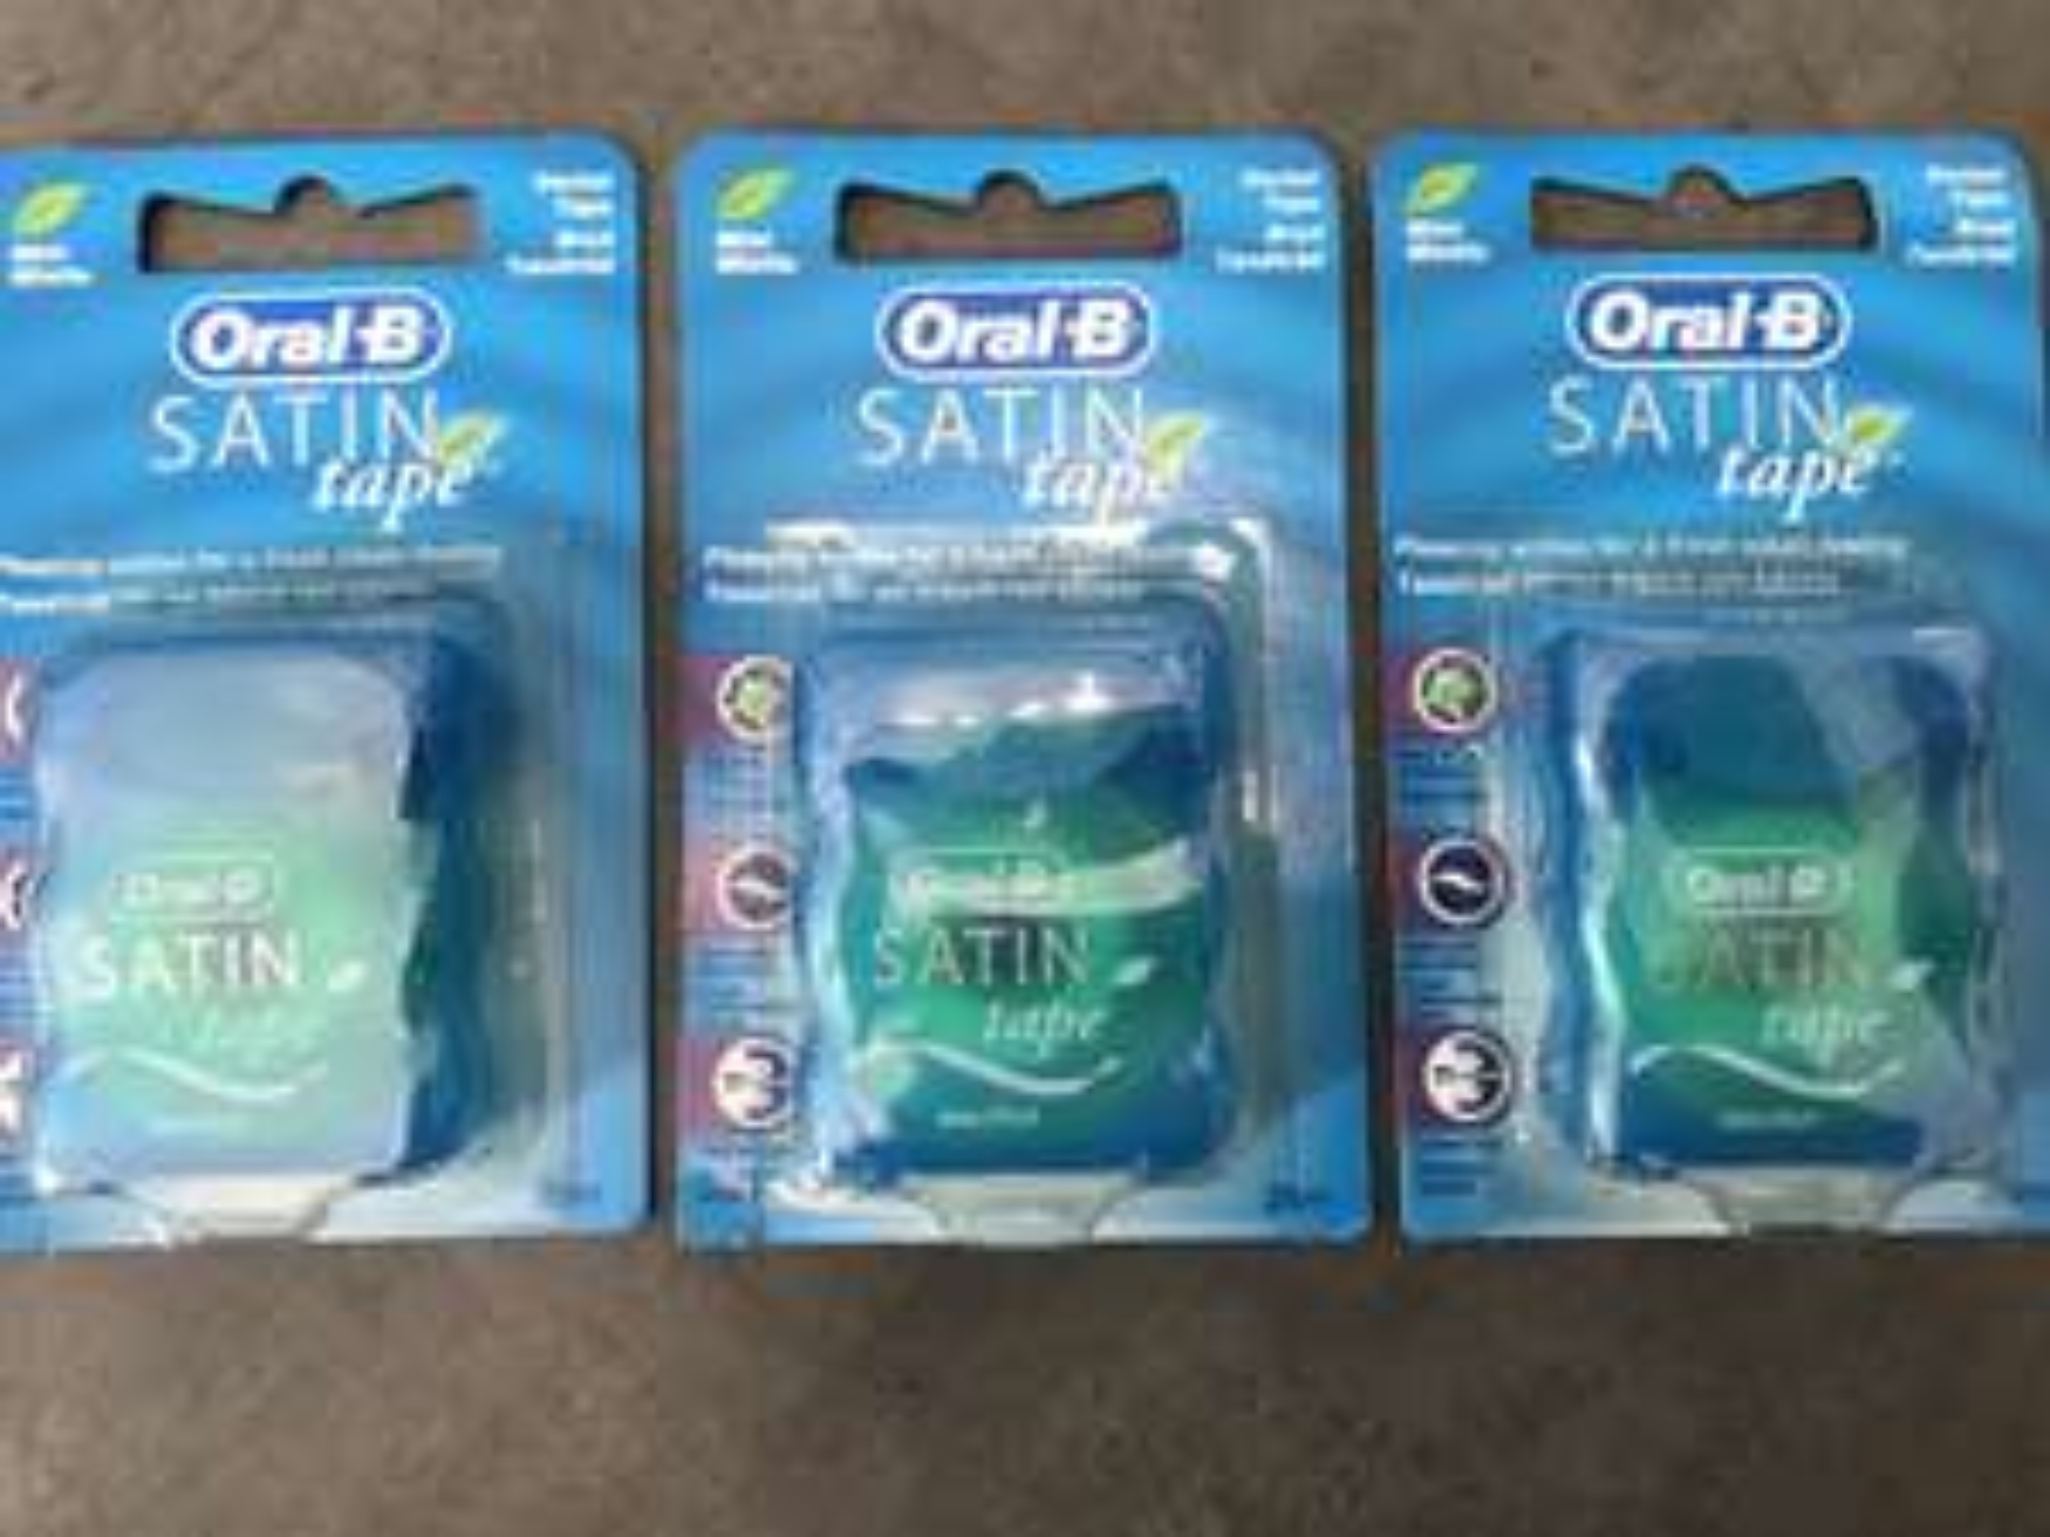 Oral B Satin Dental Tape 25m in store £1 @ Poundland